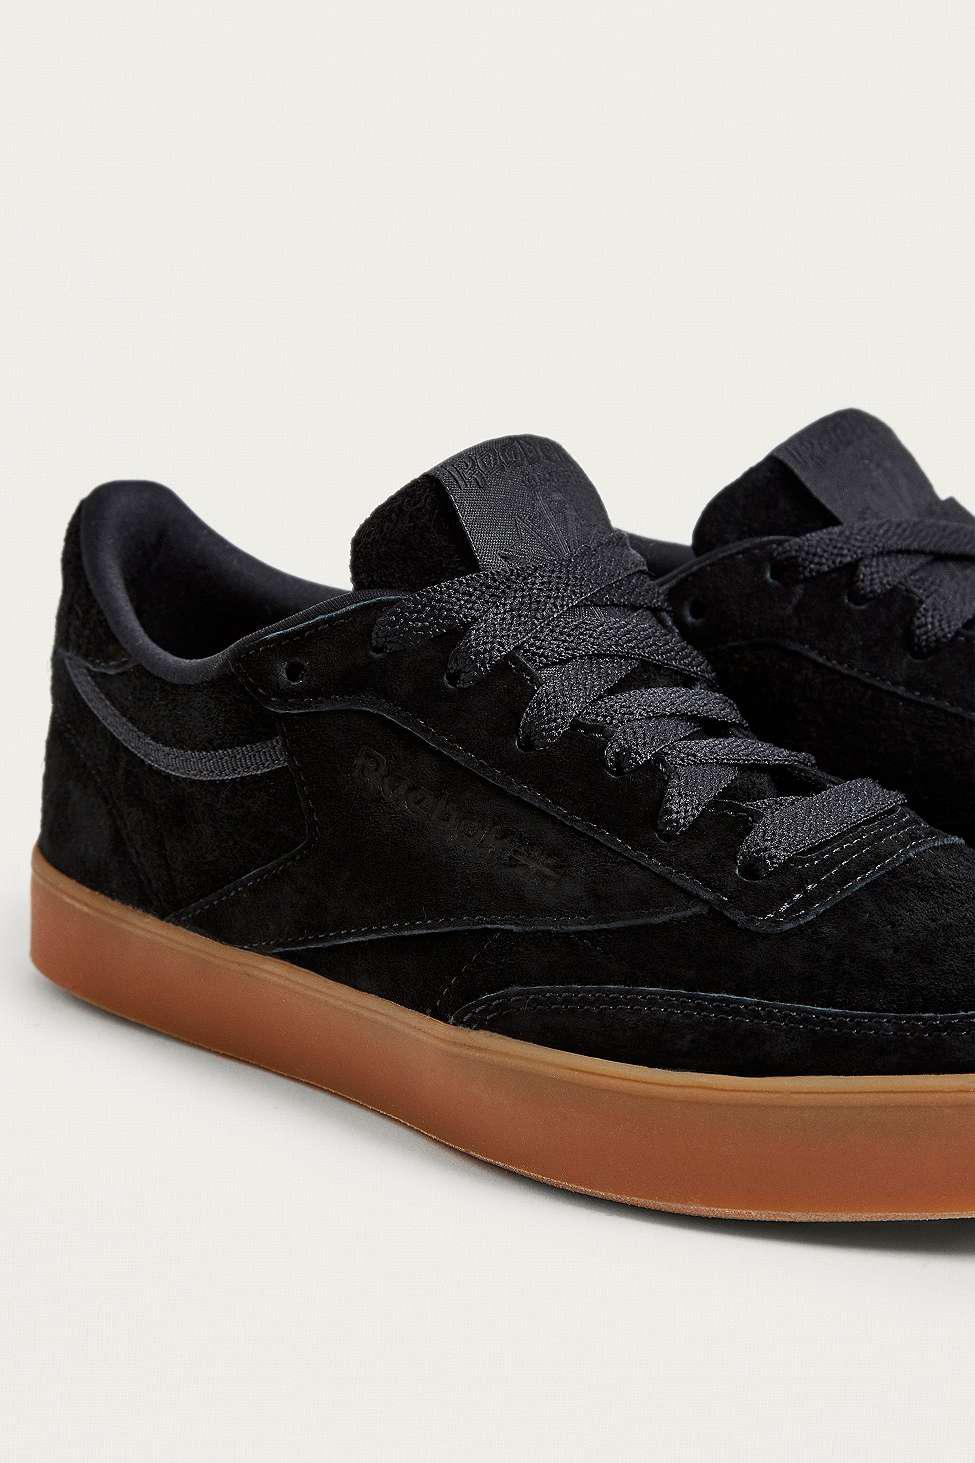 Reebok Leather Club C 85 Fvs Black Trainers